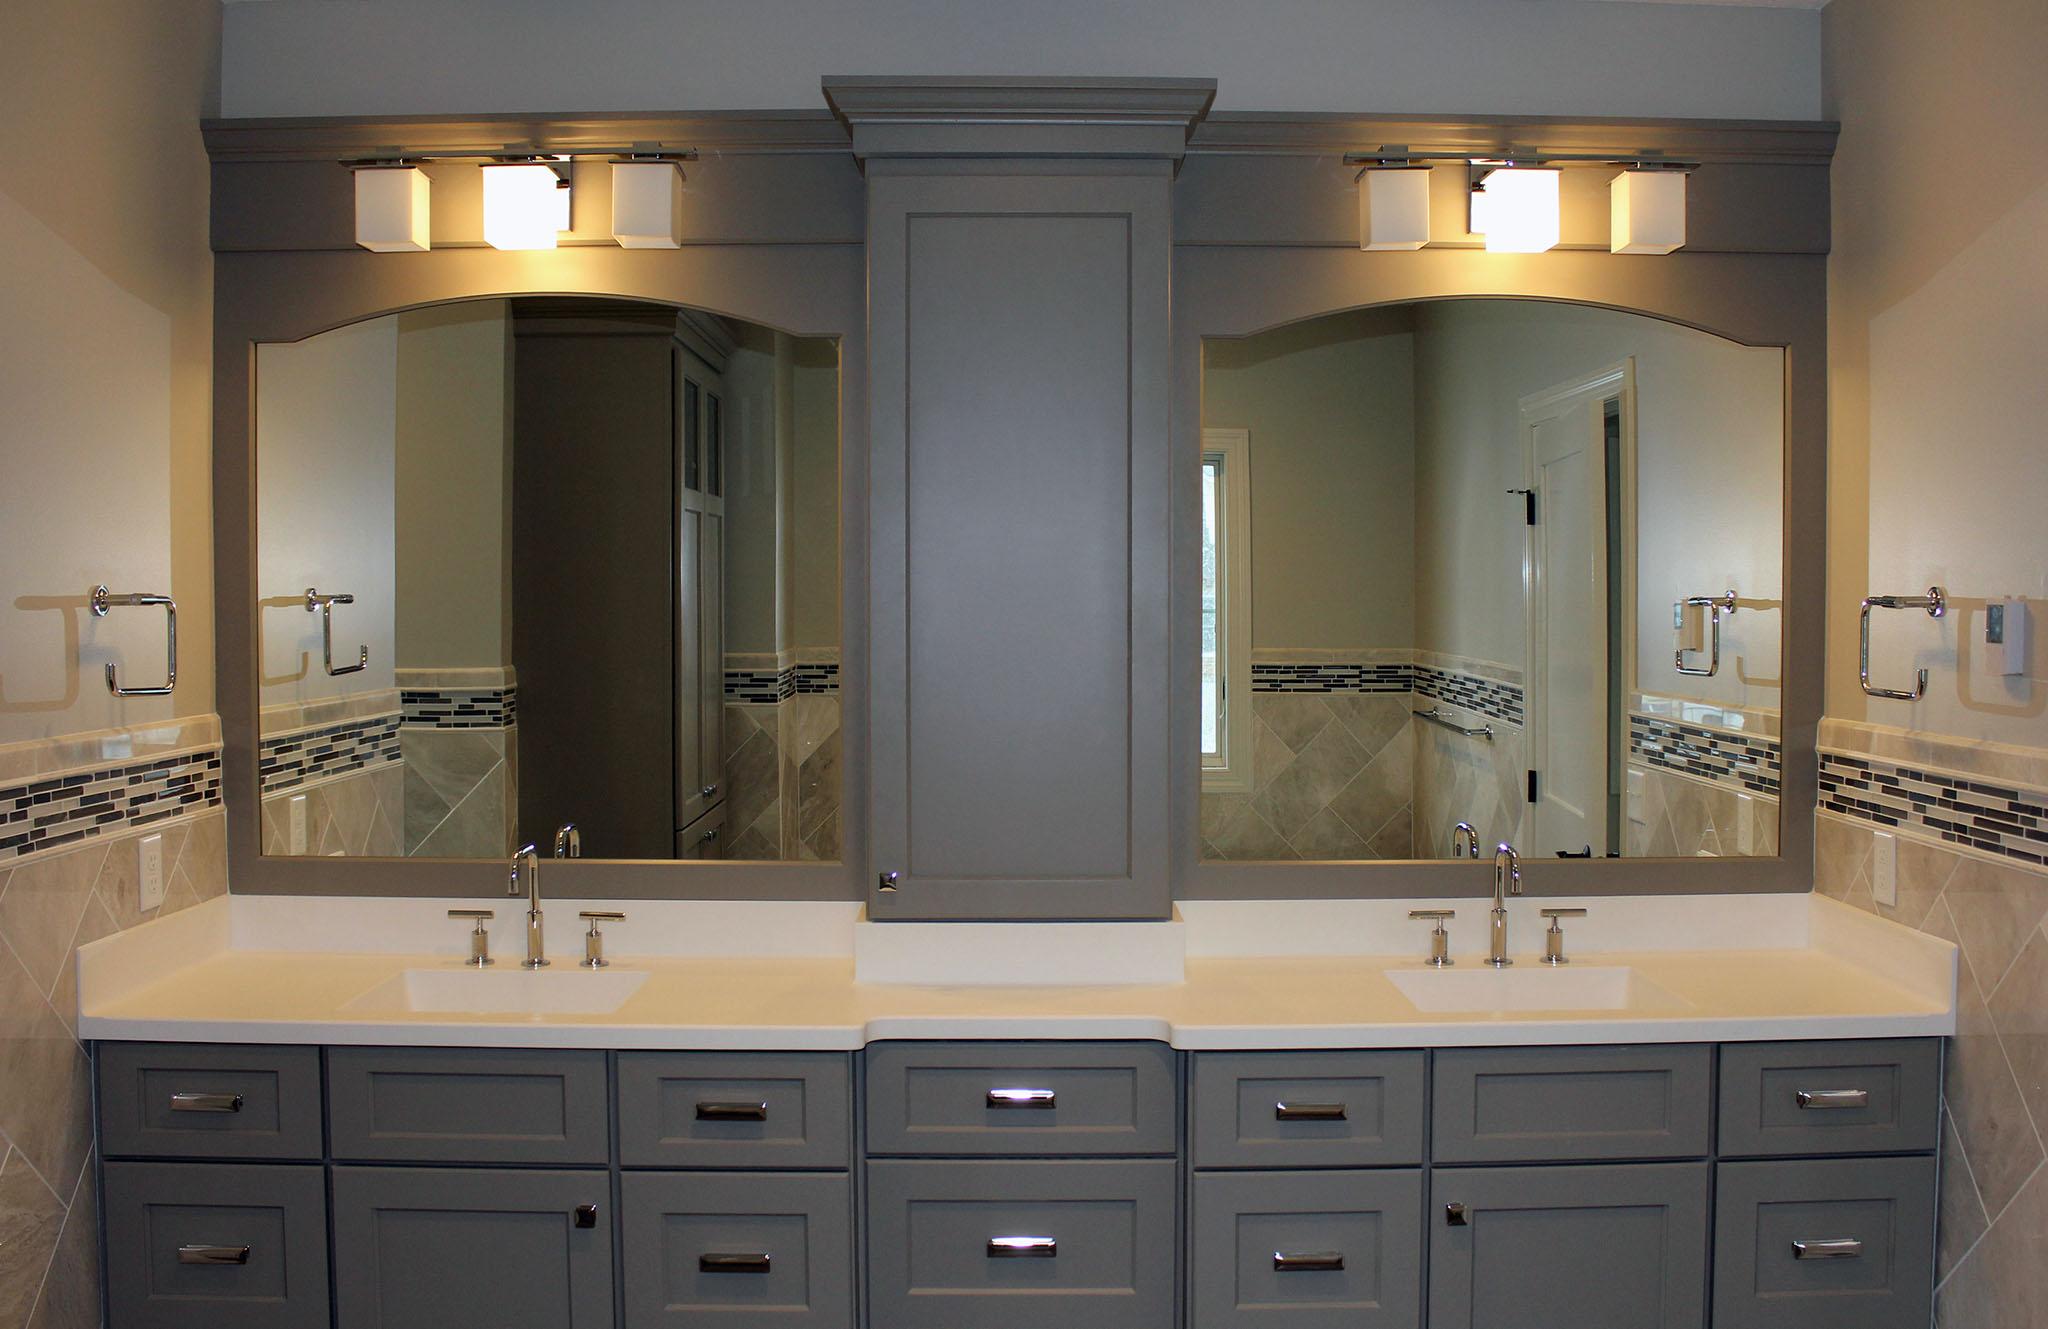 Master bath with painted poplar cabinets, tile backsplash, arched mirror frames